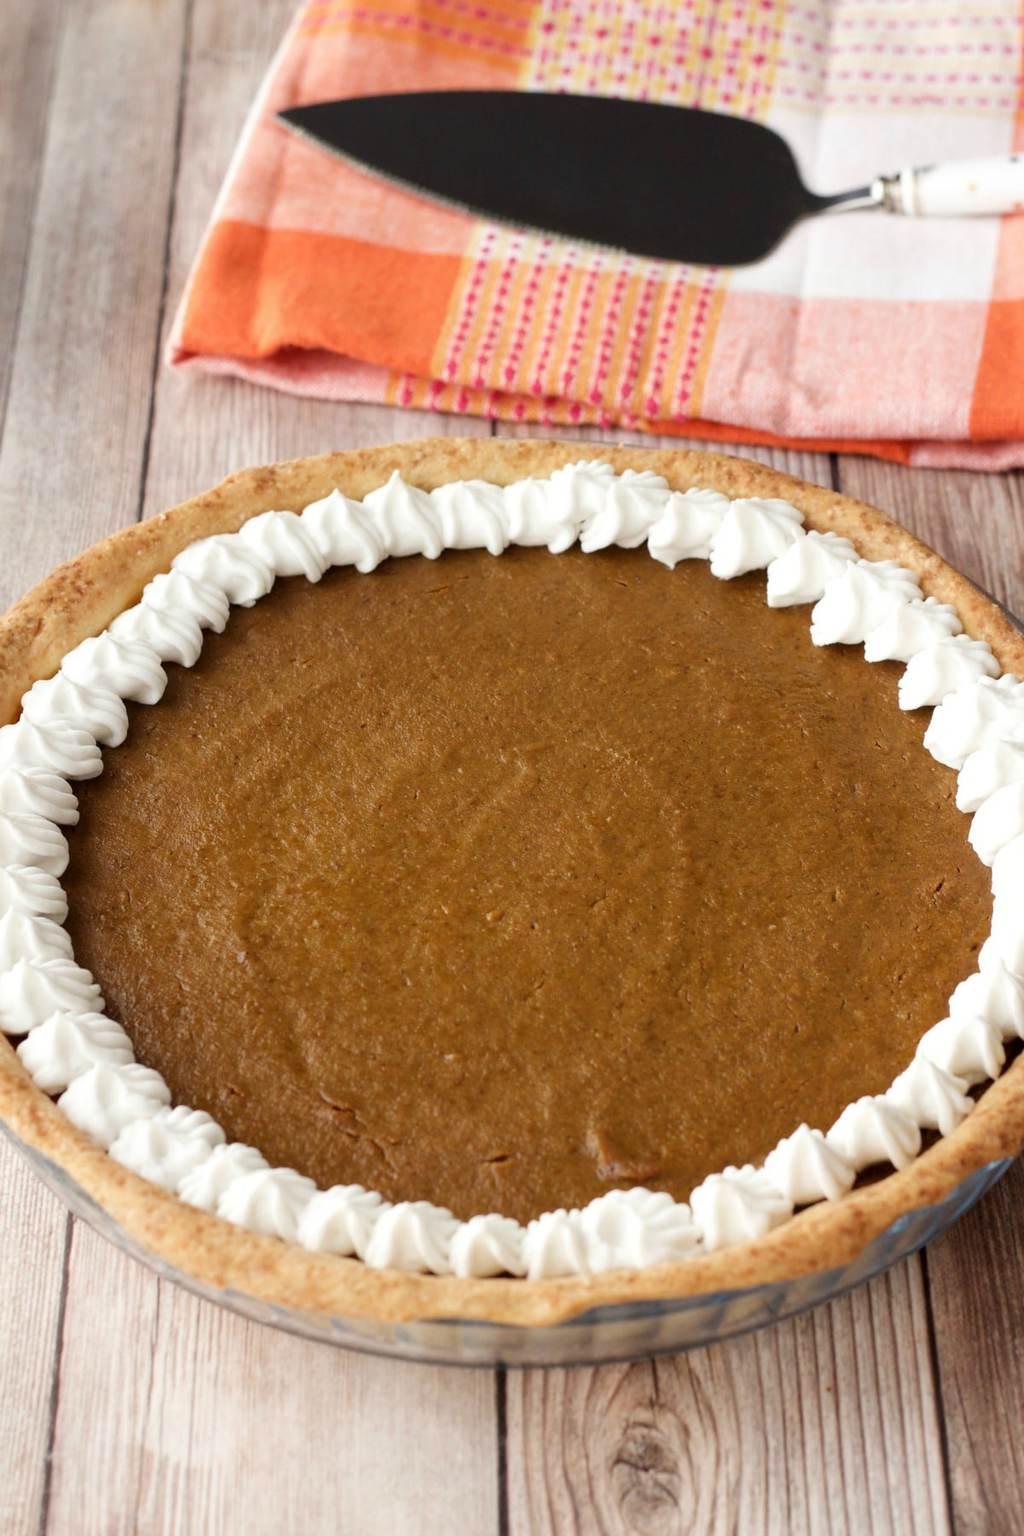 Freshly baked vegan pumpkin pie with whipped cream.